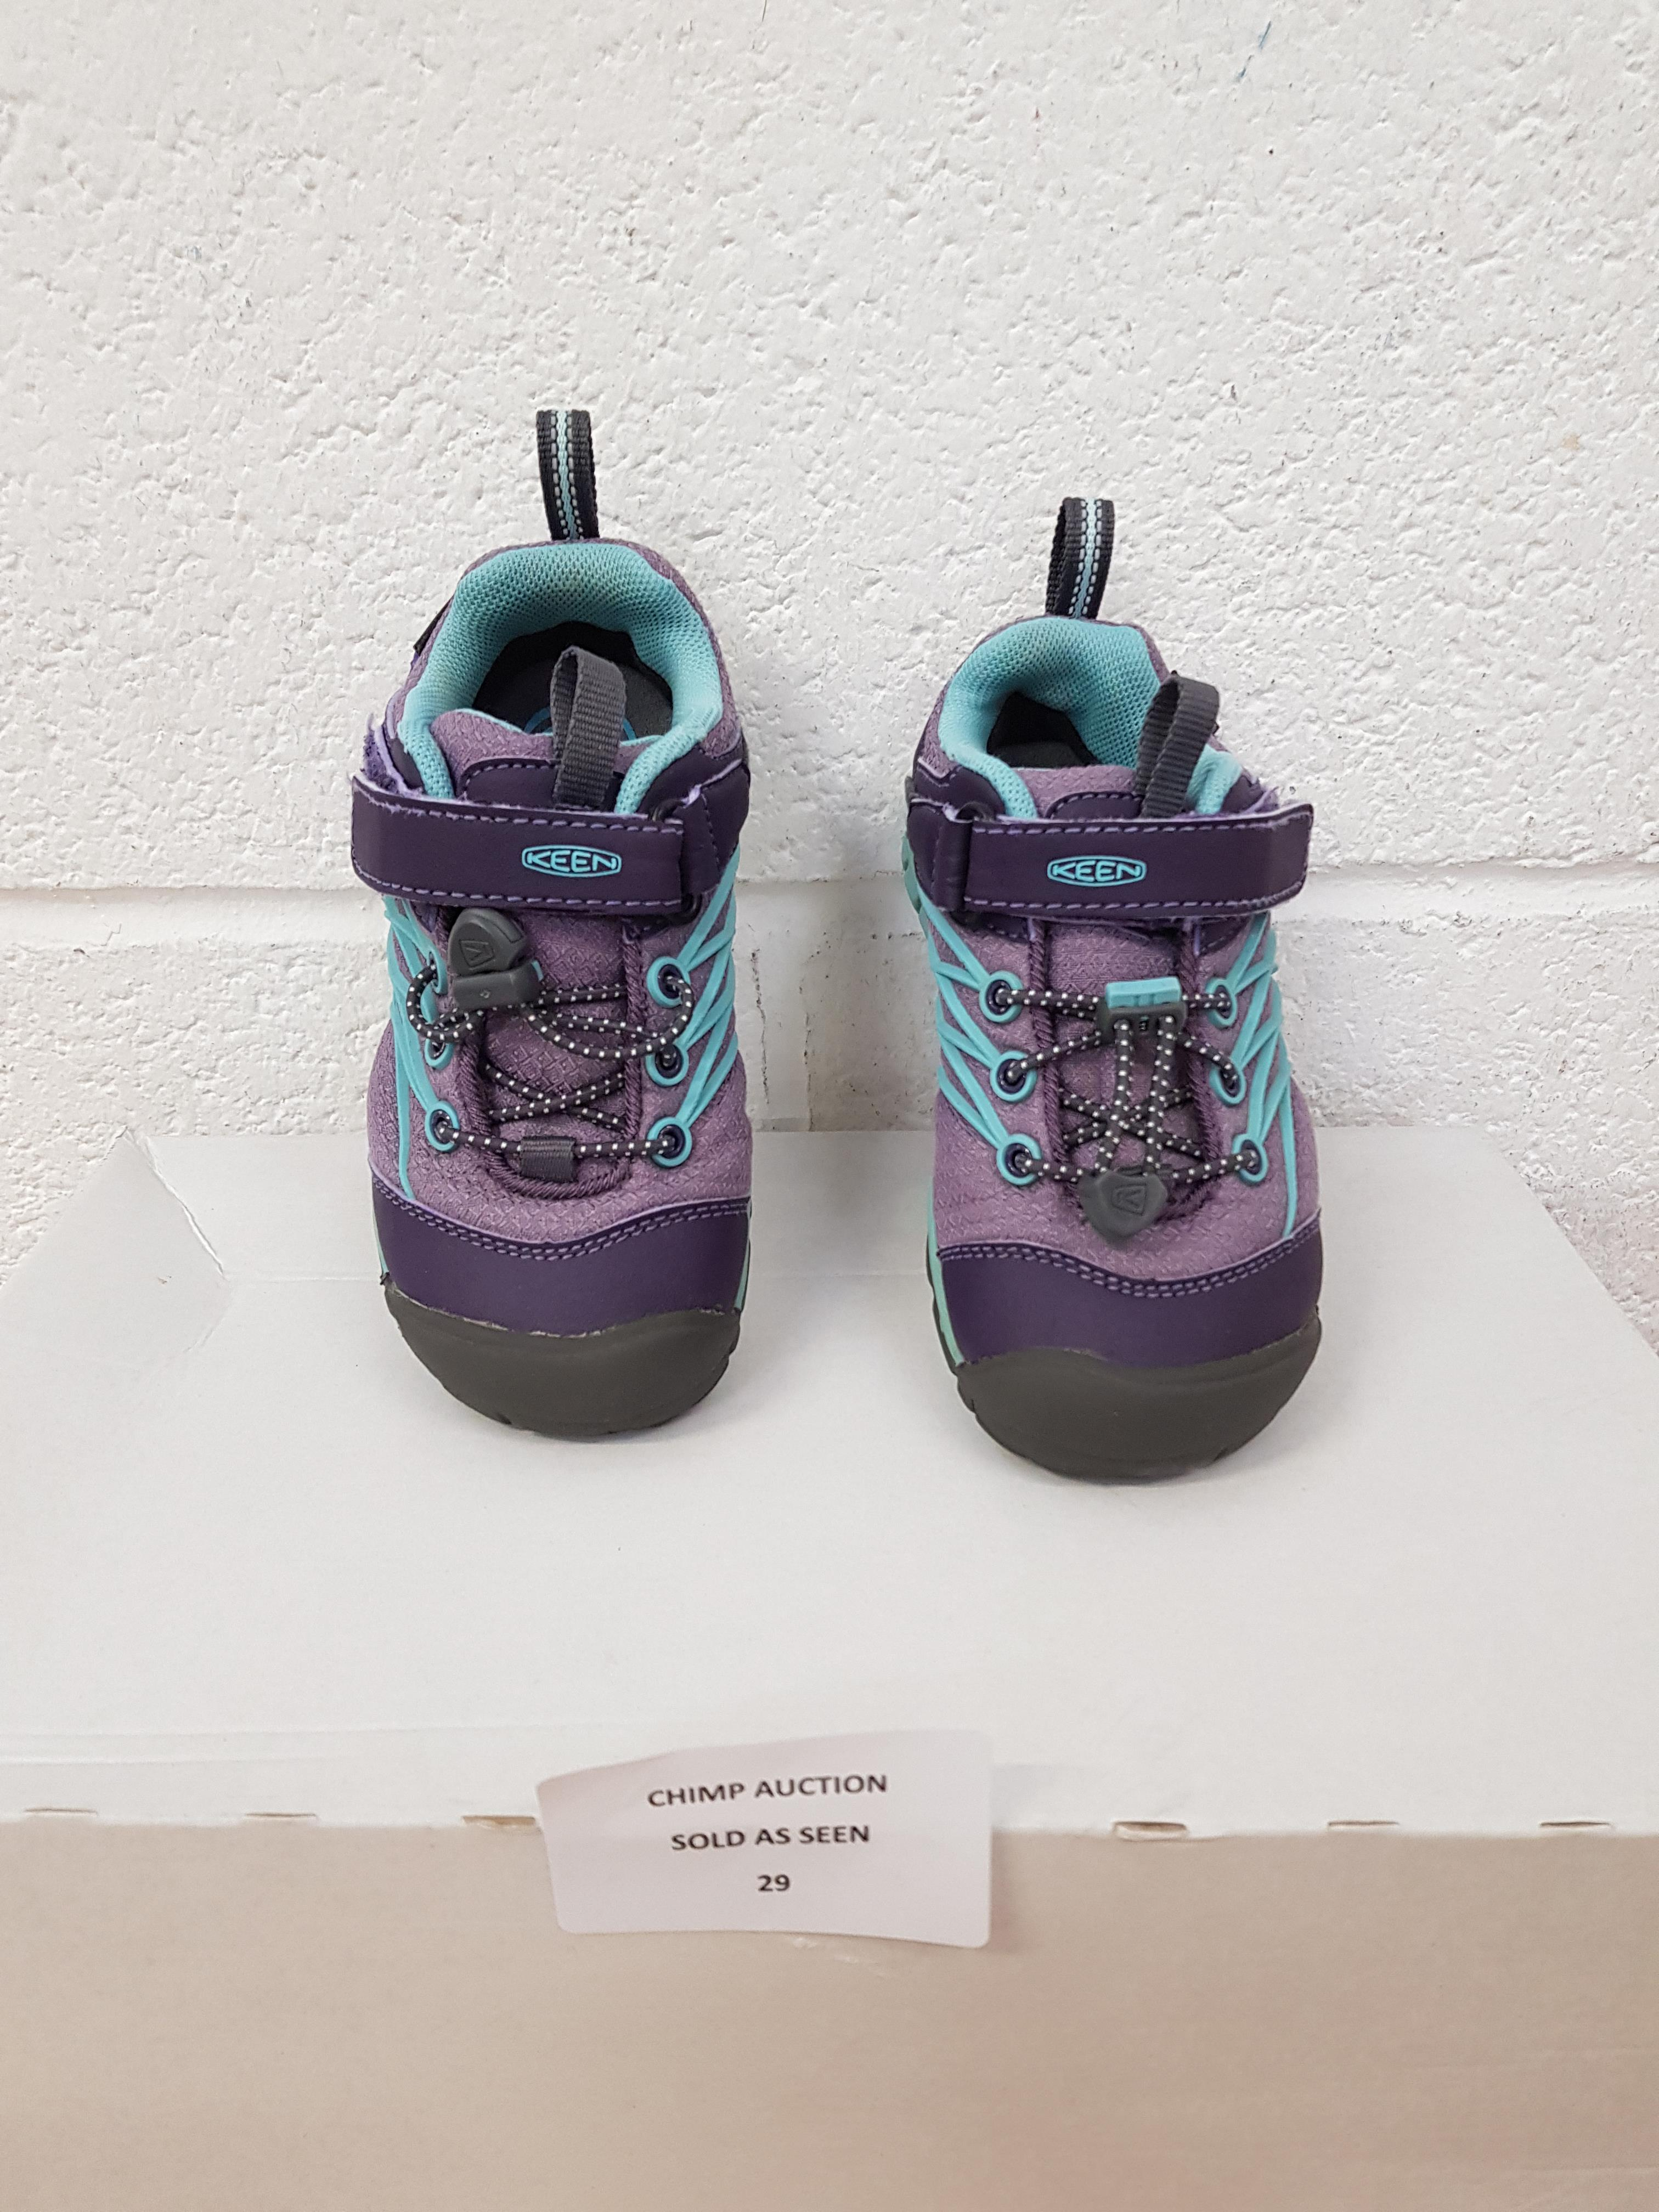 Lot 29 - Keen Kids shoes UK 10